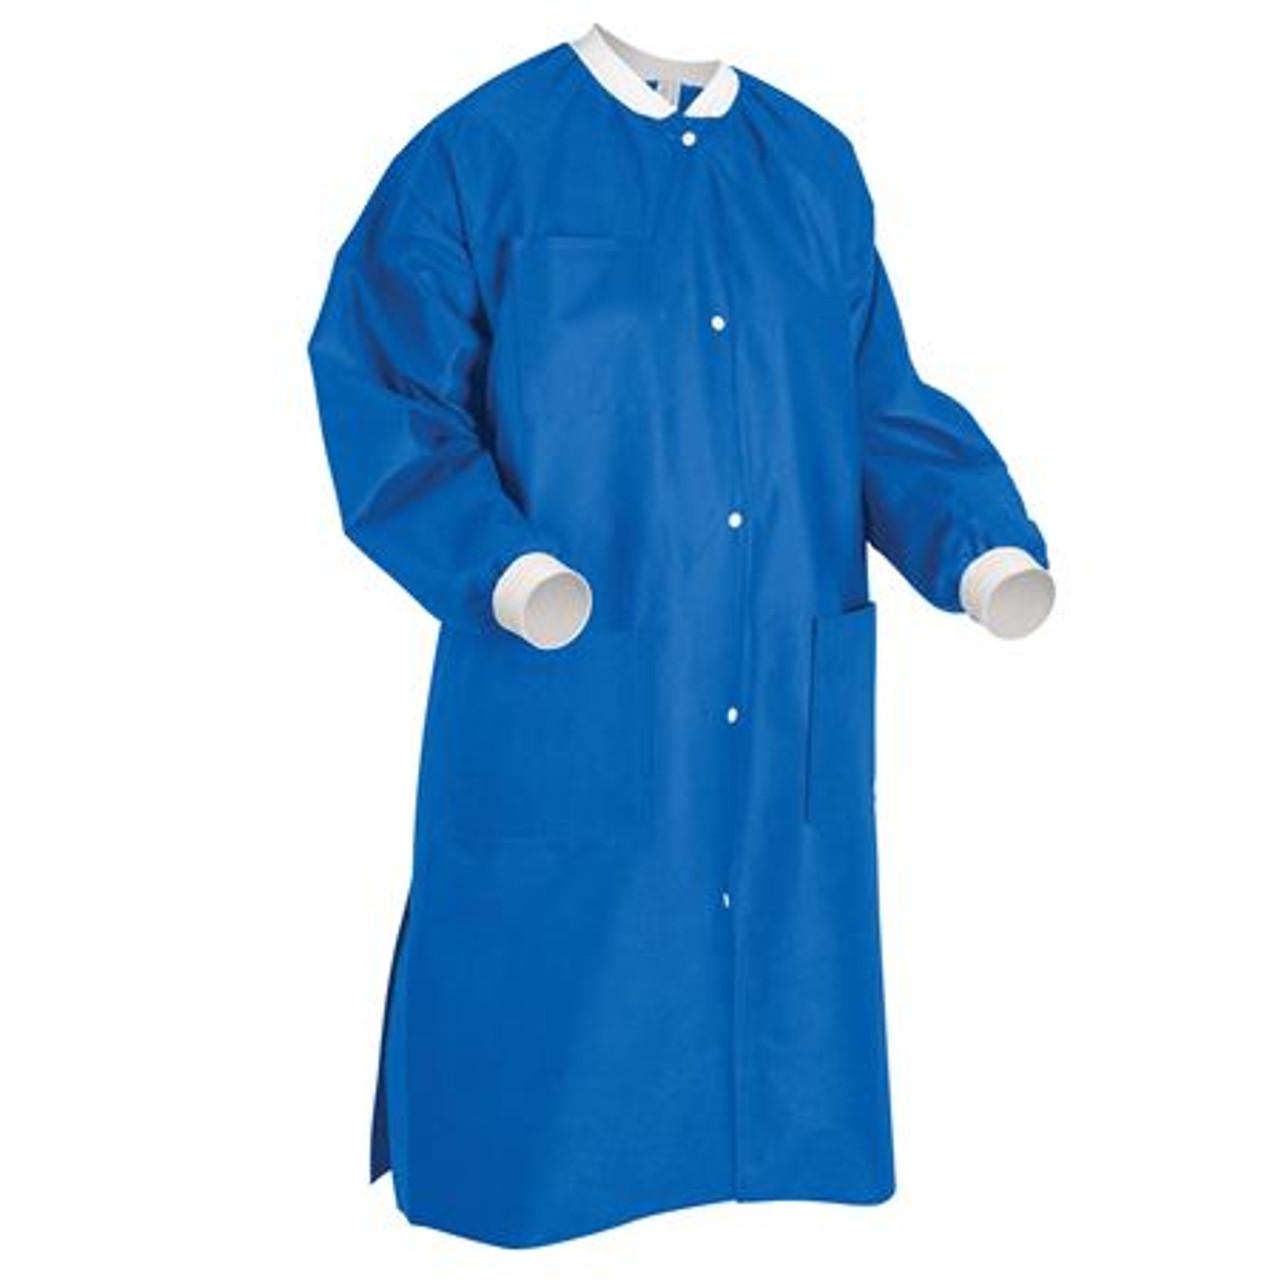 ValuMax Lab Coat Royal Blue